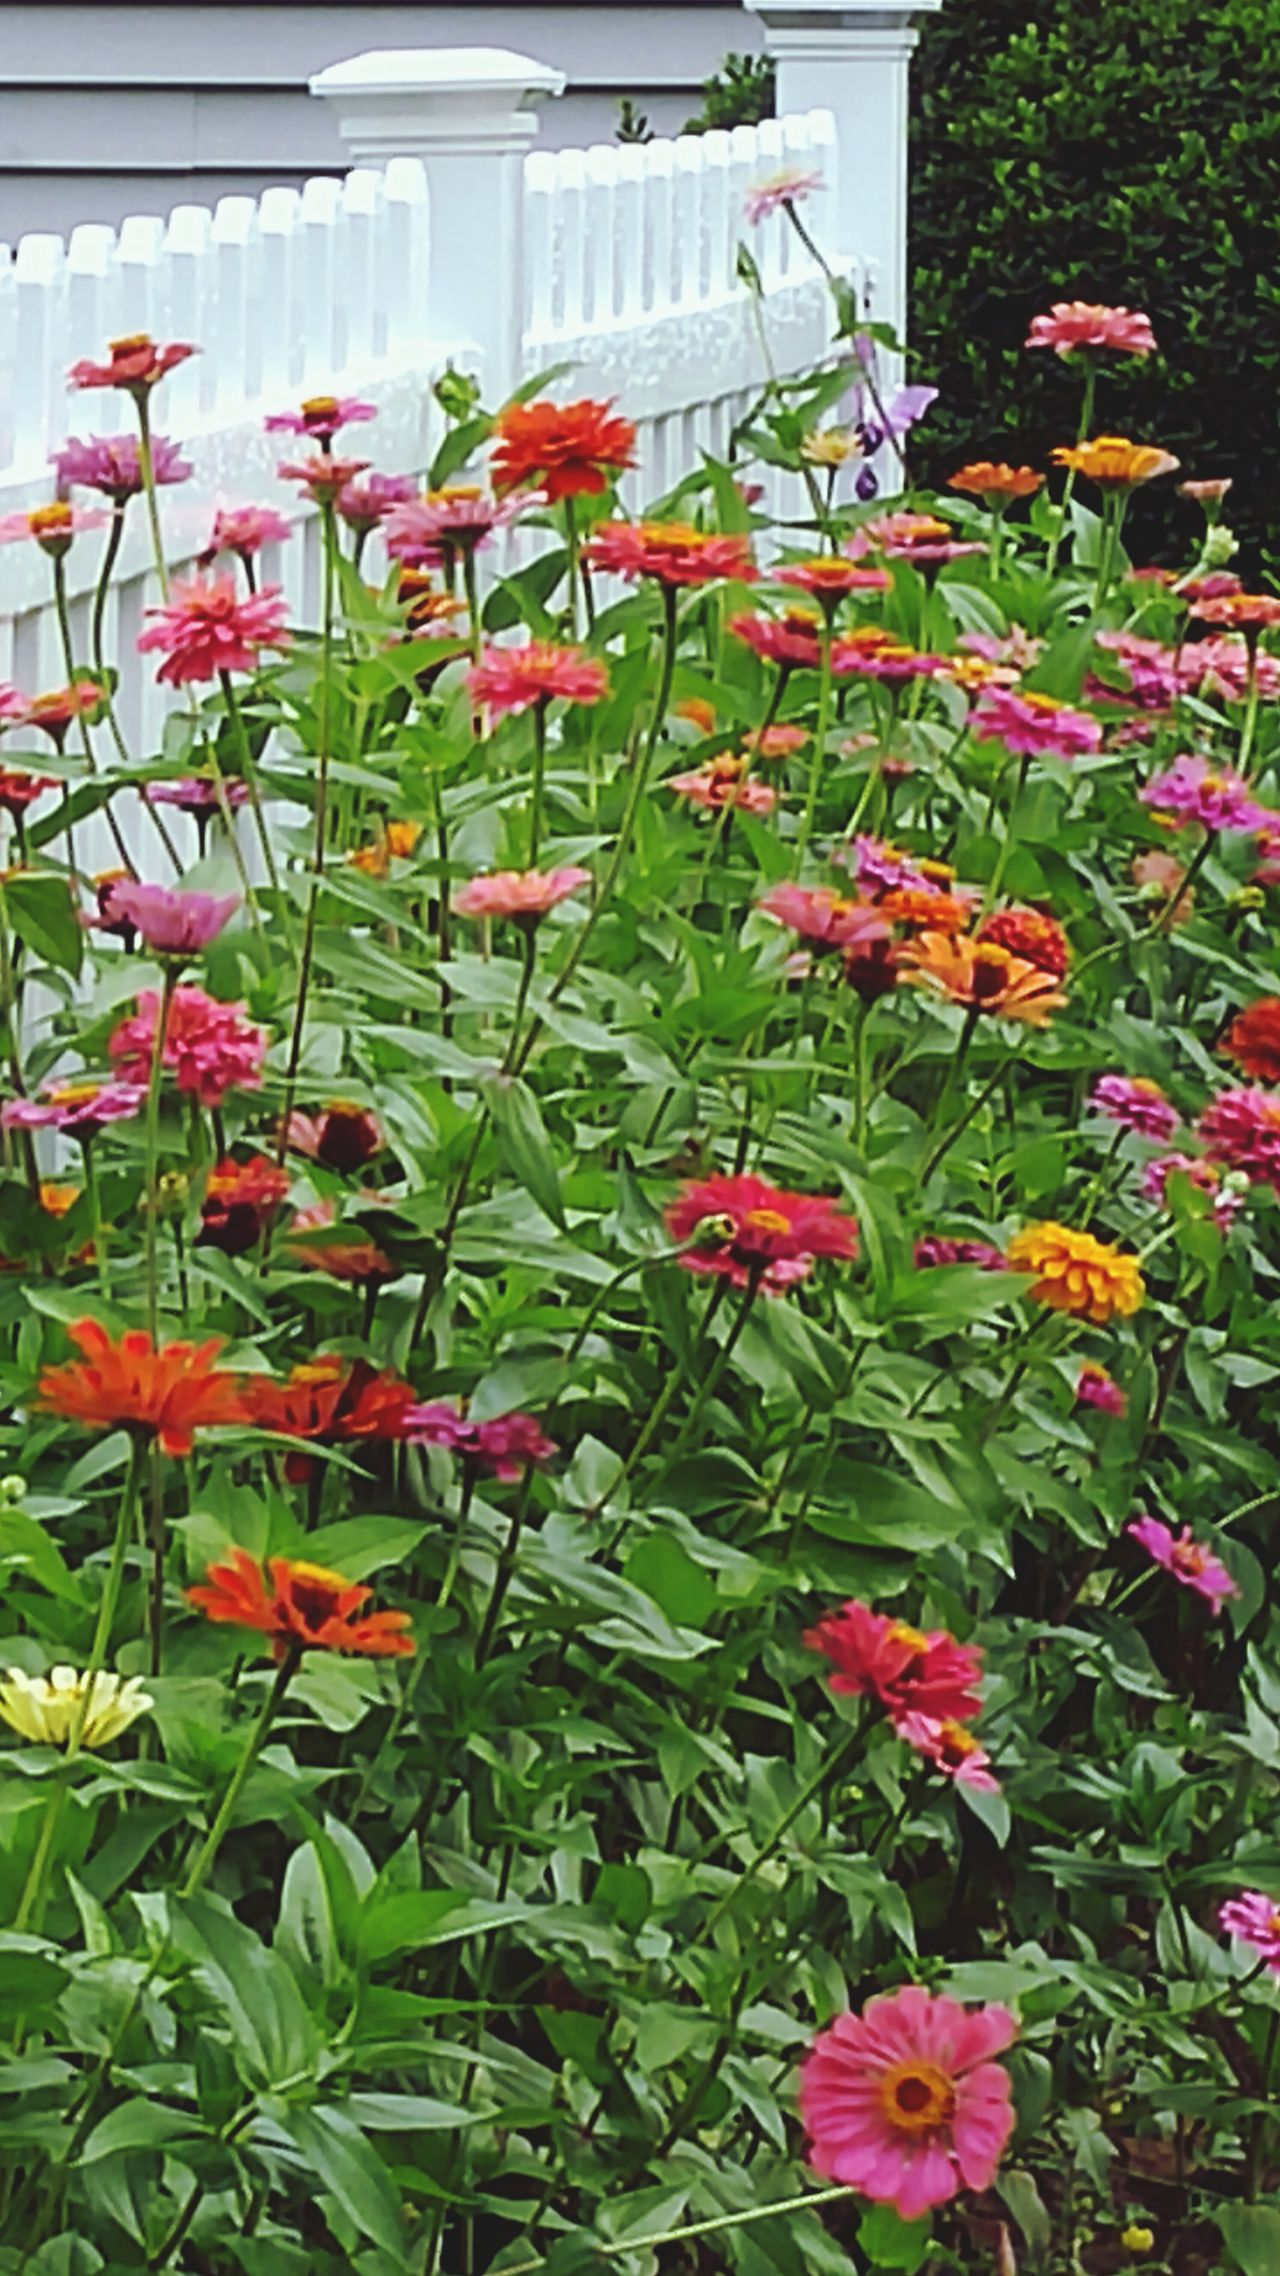 Zinnias Flowers My Garden @my Home Flower Collection Flower Porn Beautiful Flowers God's Beauty